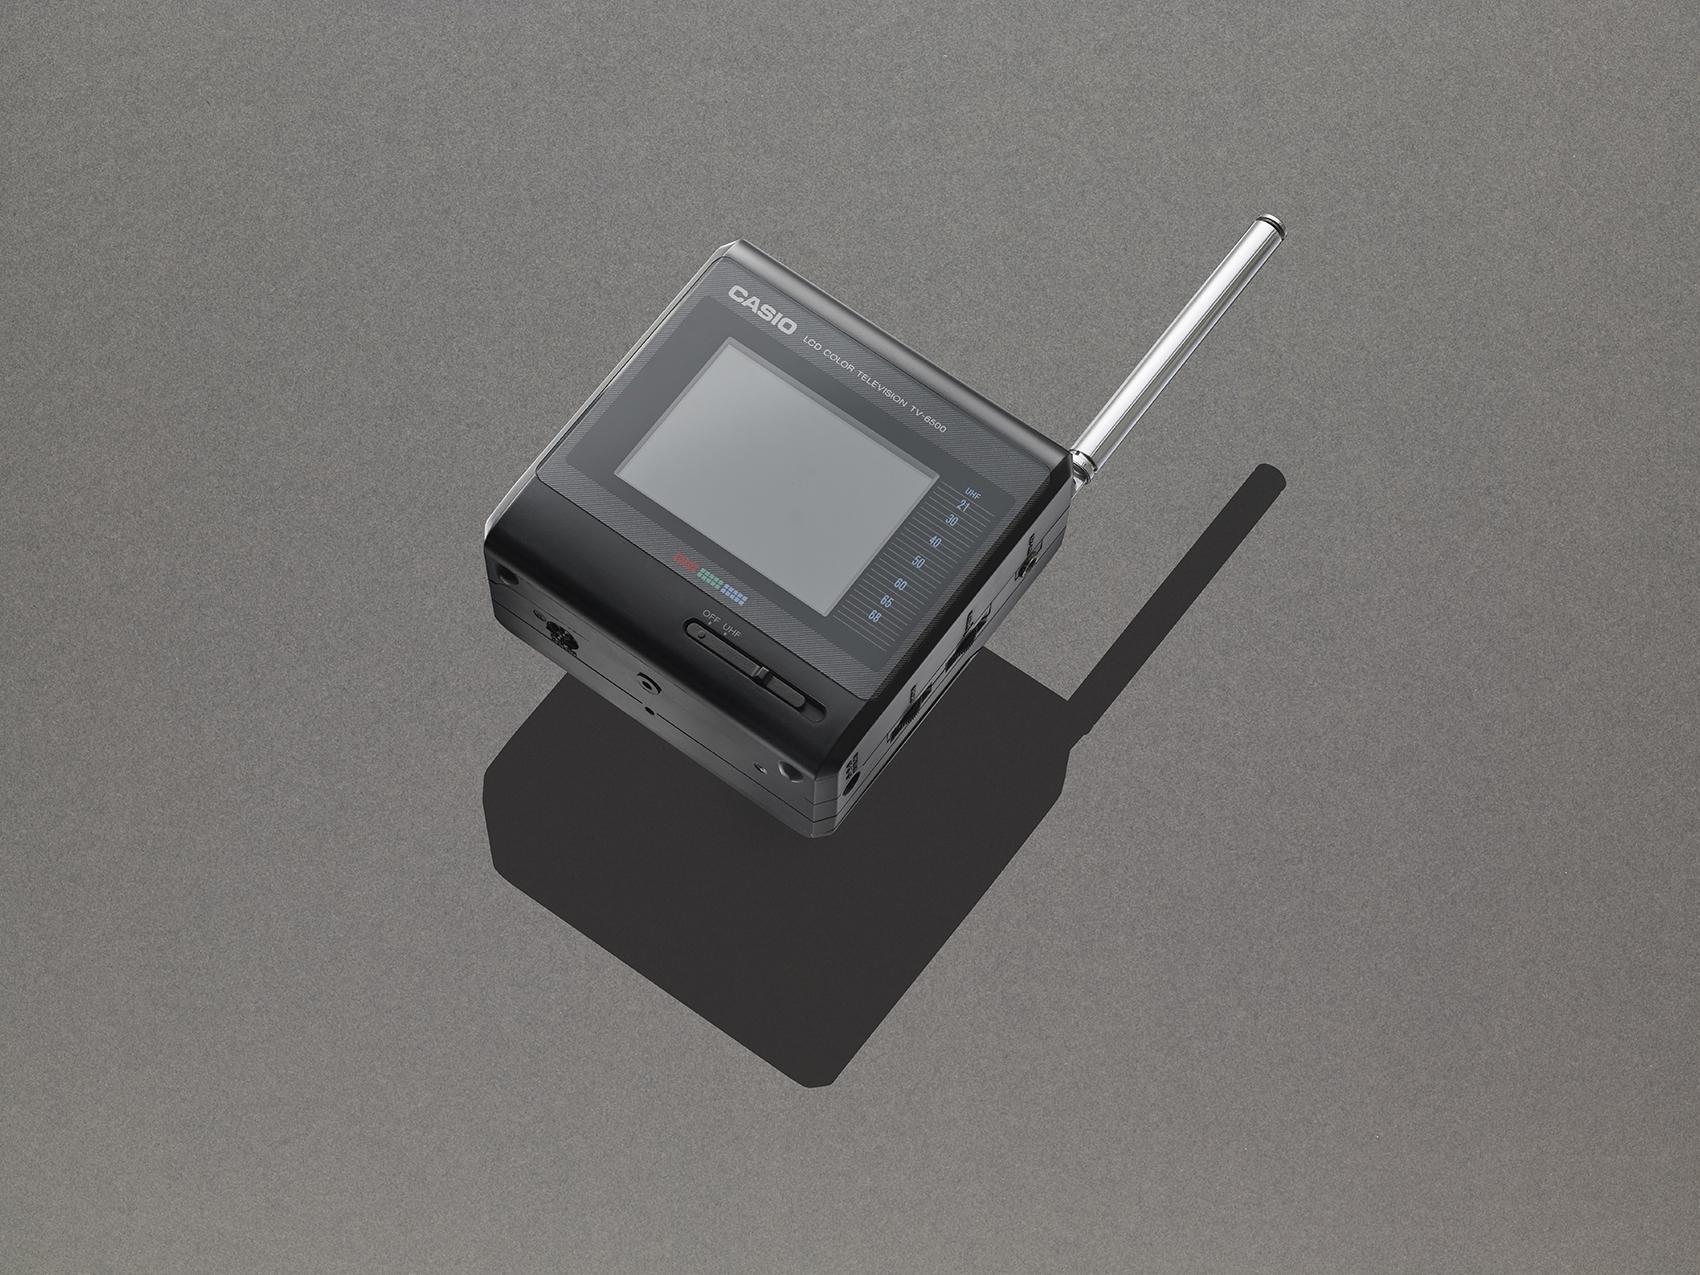 Casio TV.jpg